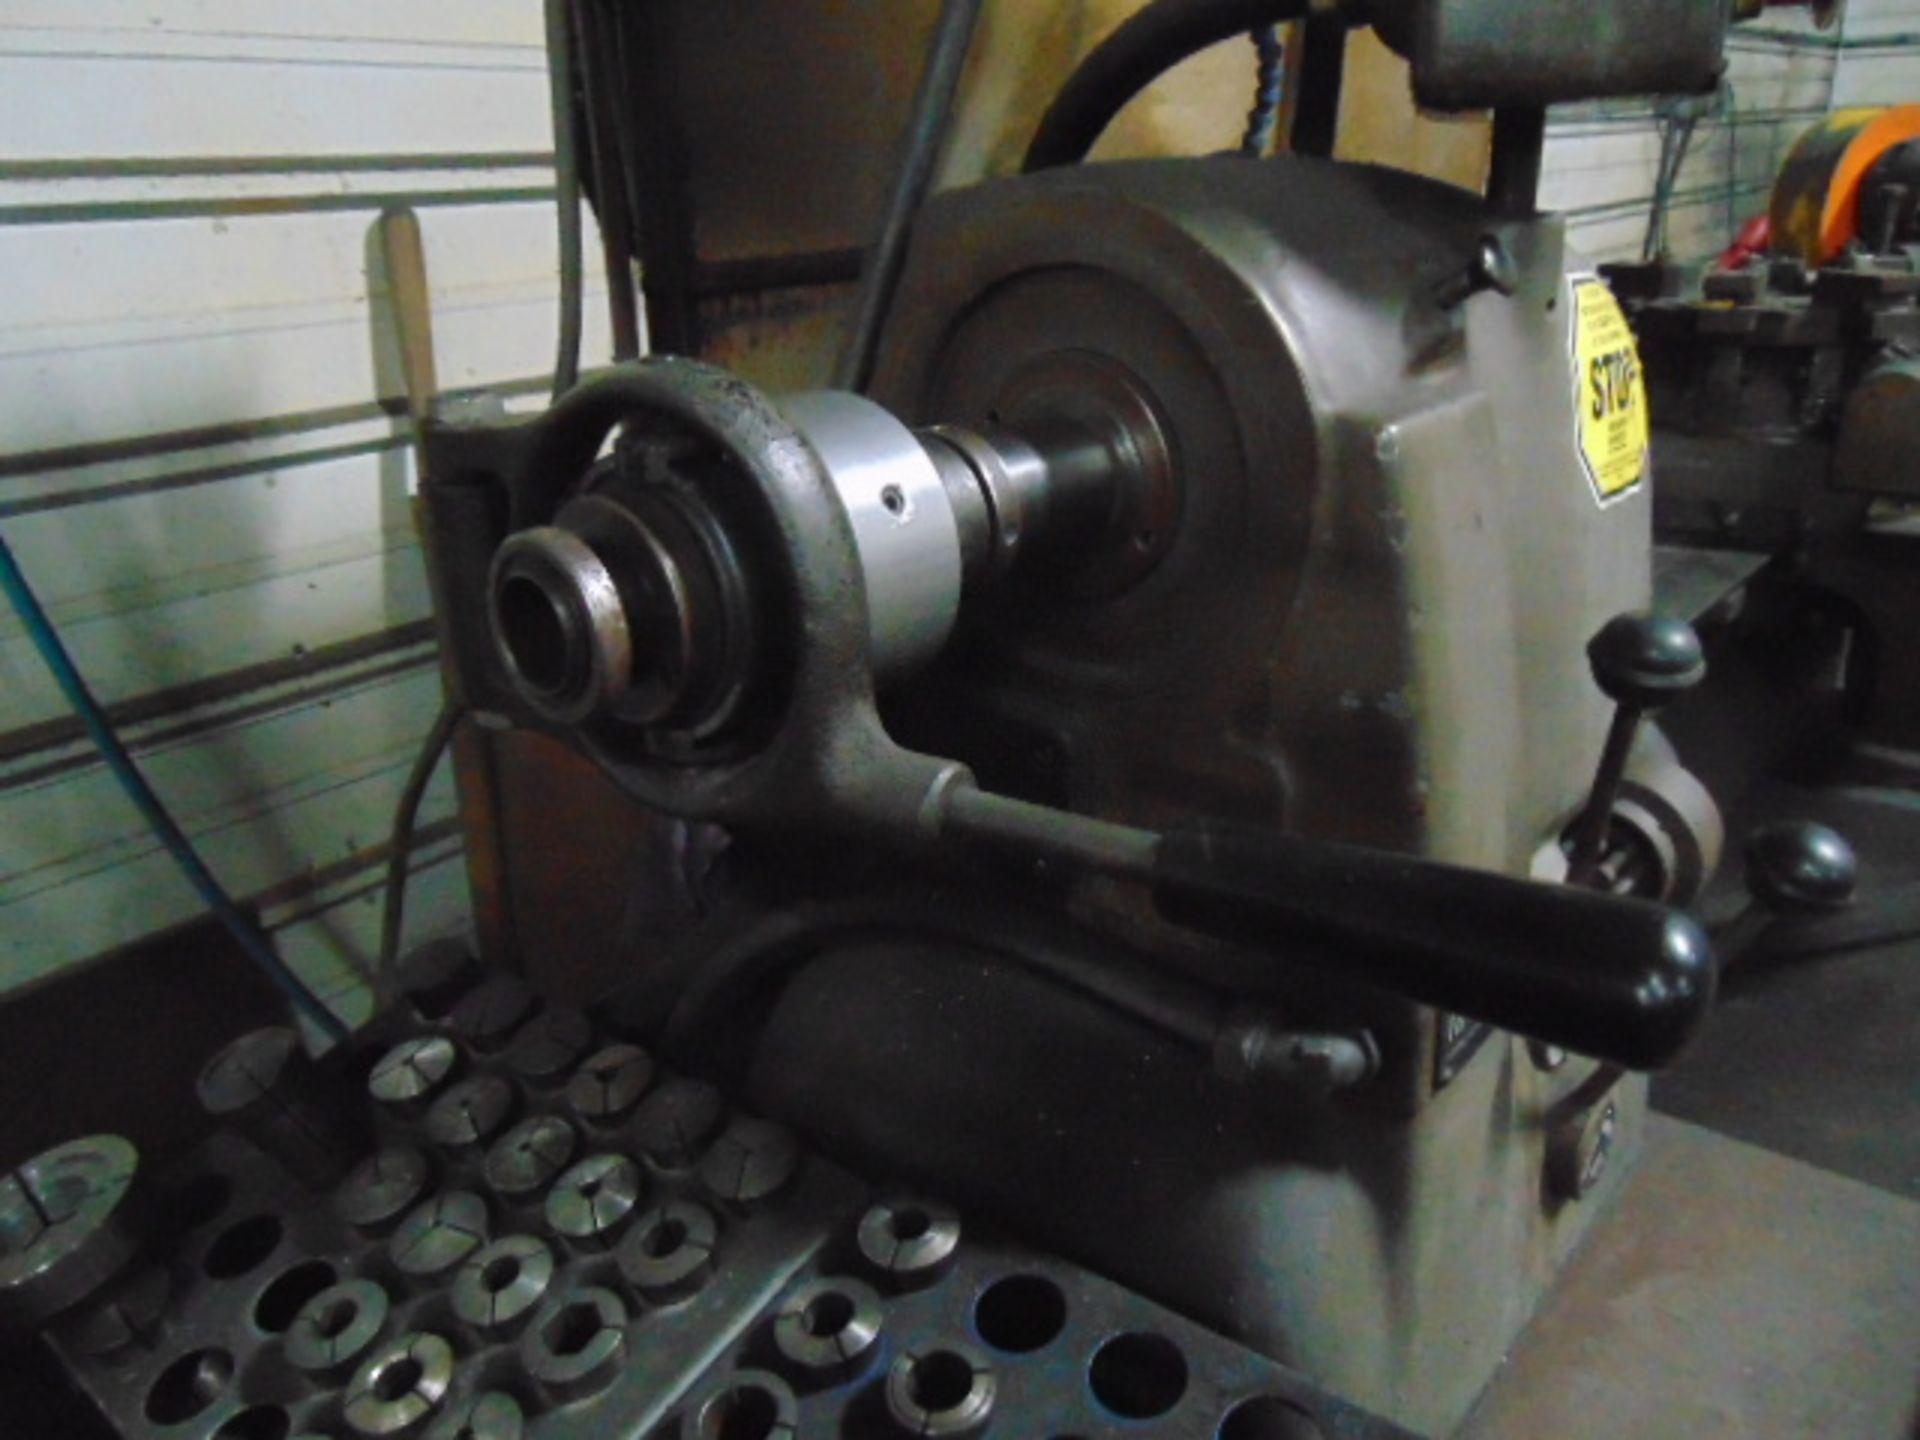 Lot 42 - CHUCKER, HARDINGE MDL. HC, 6 pos. turret, spds: 125-3000 RPM, lever type collet closer, assorted